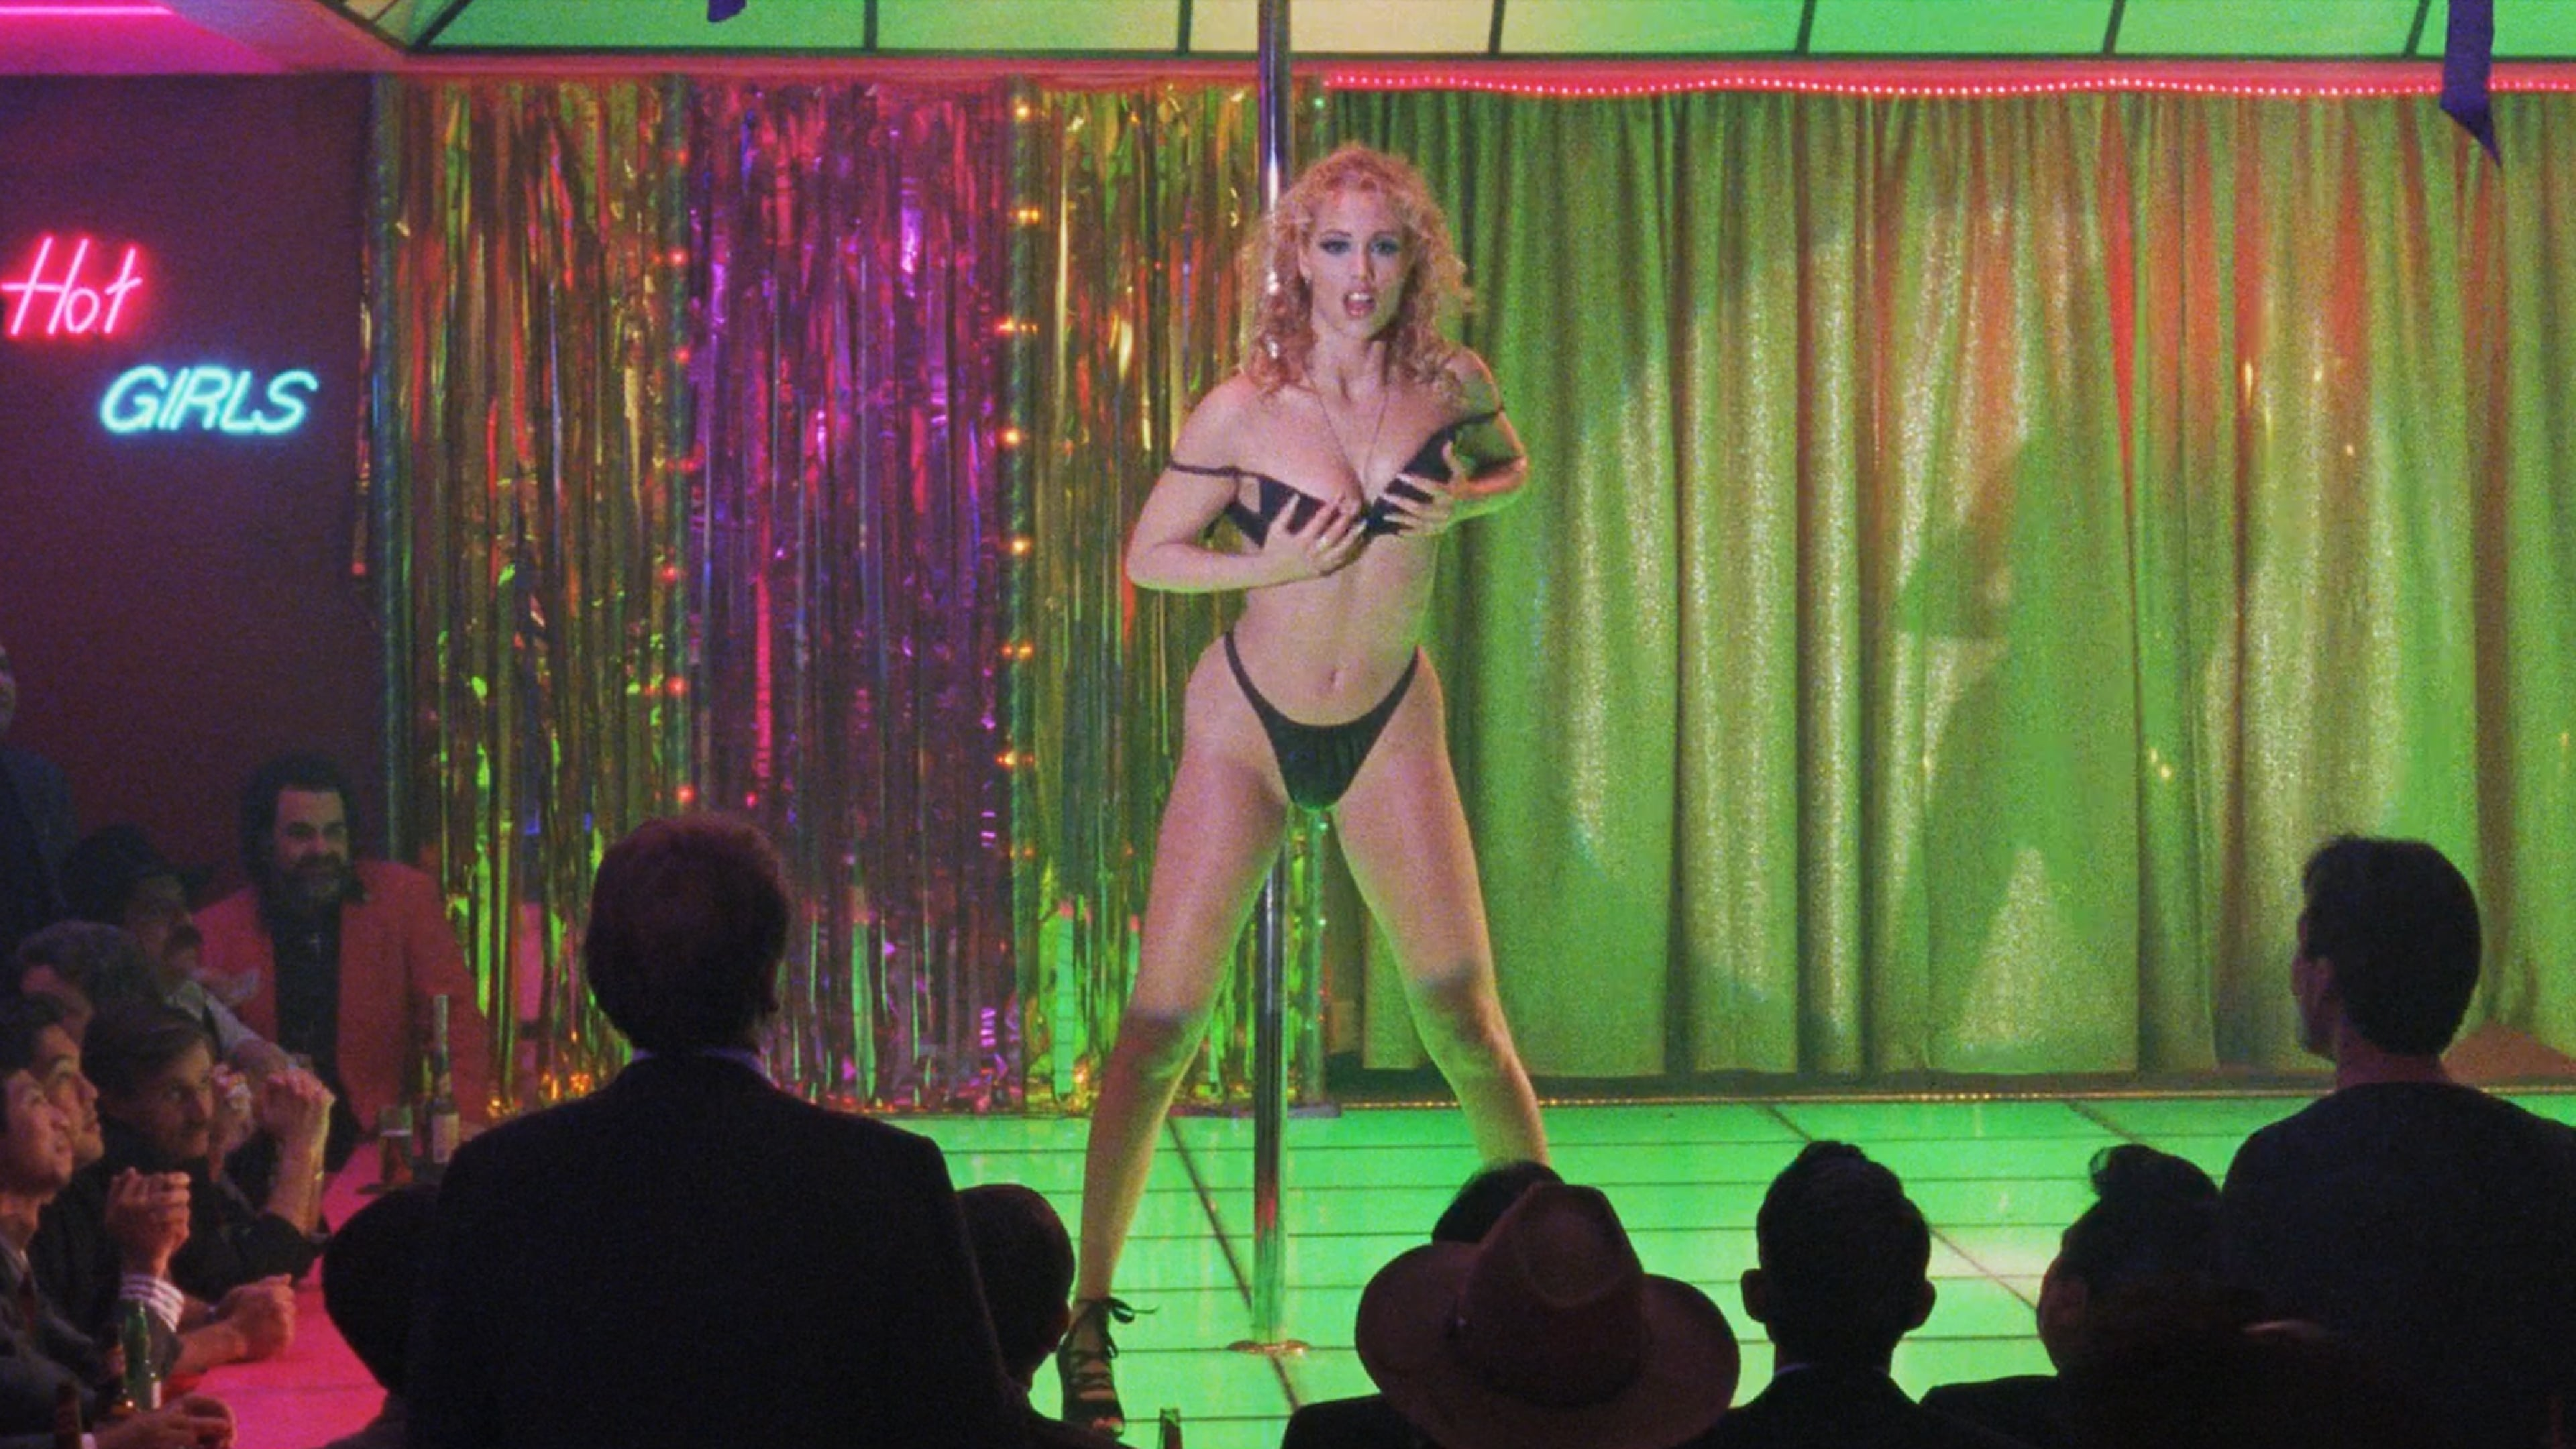 Showgirls full movie free